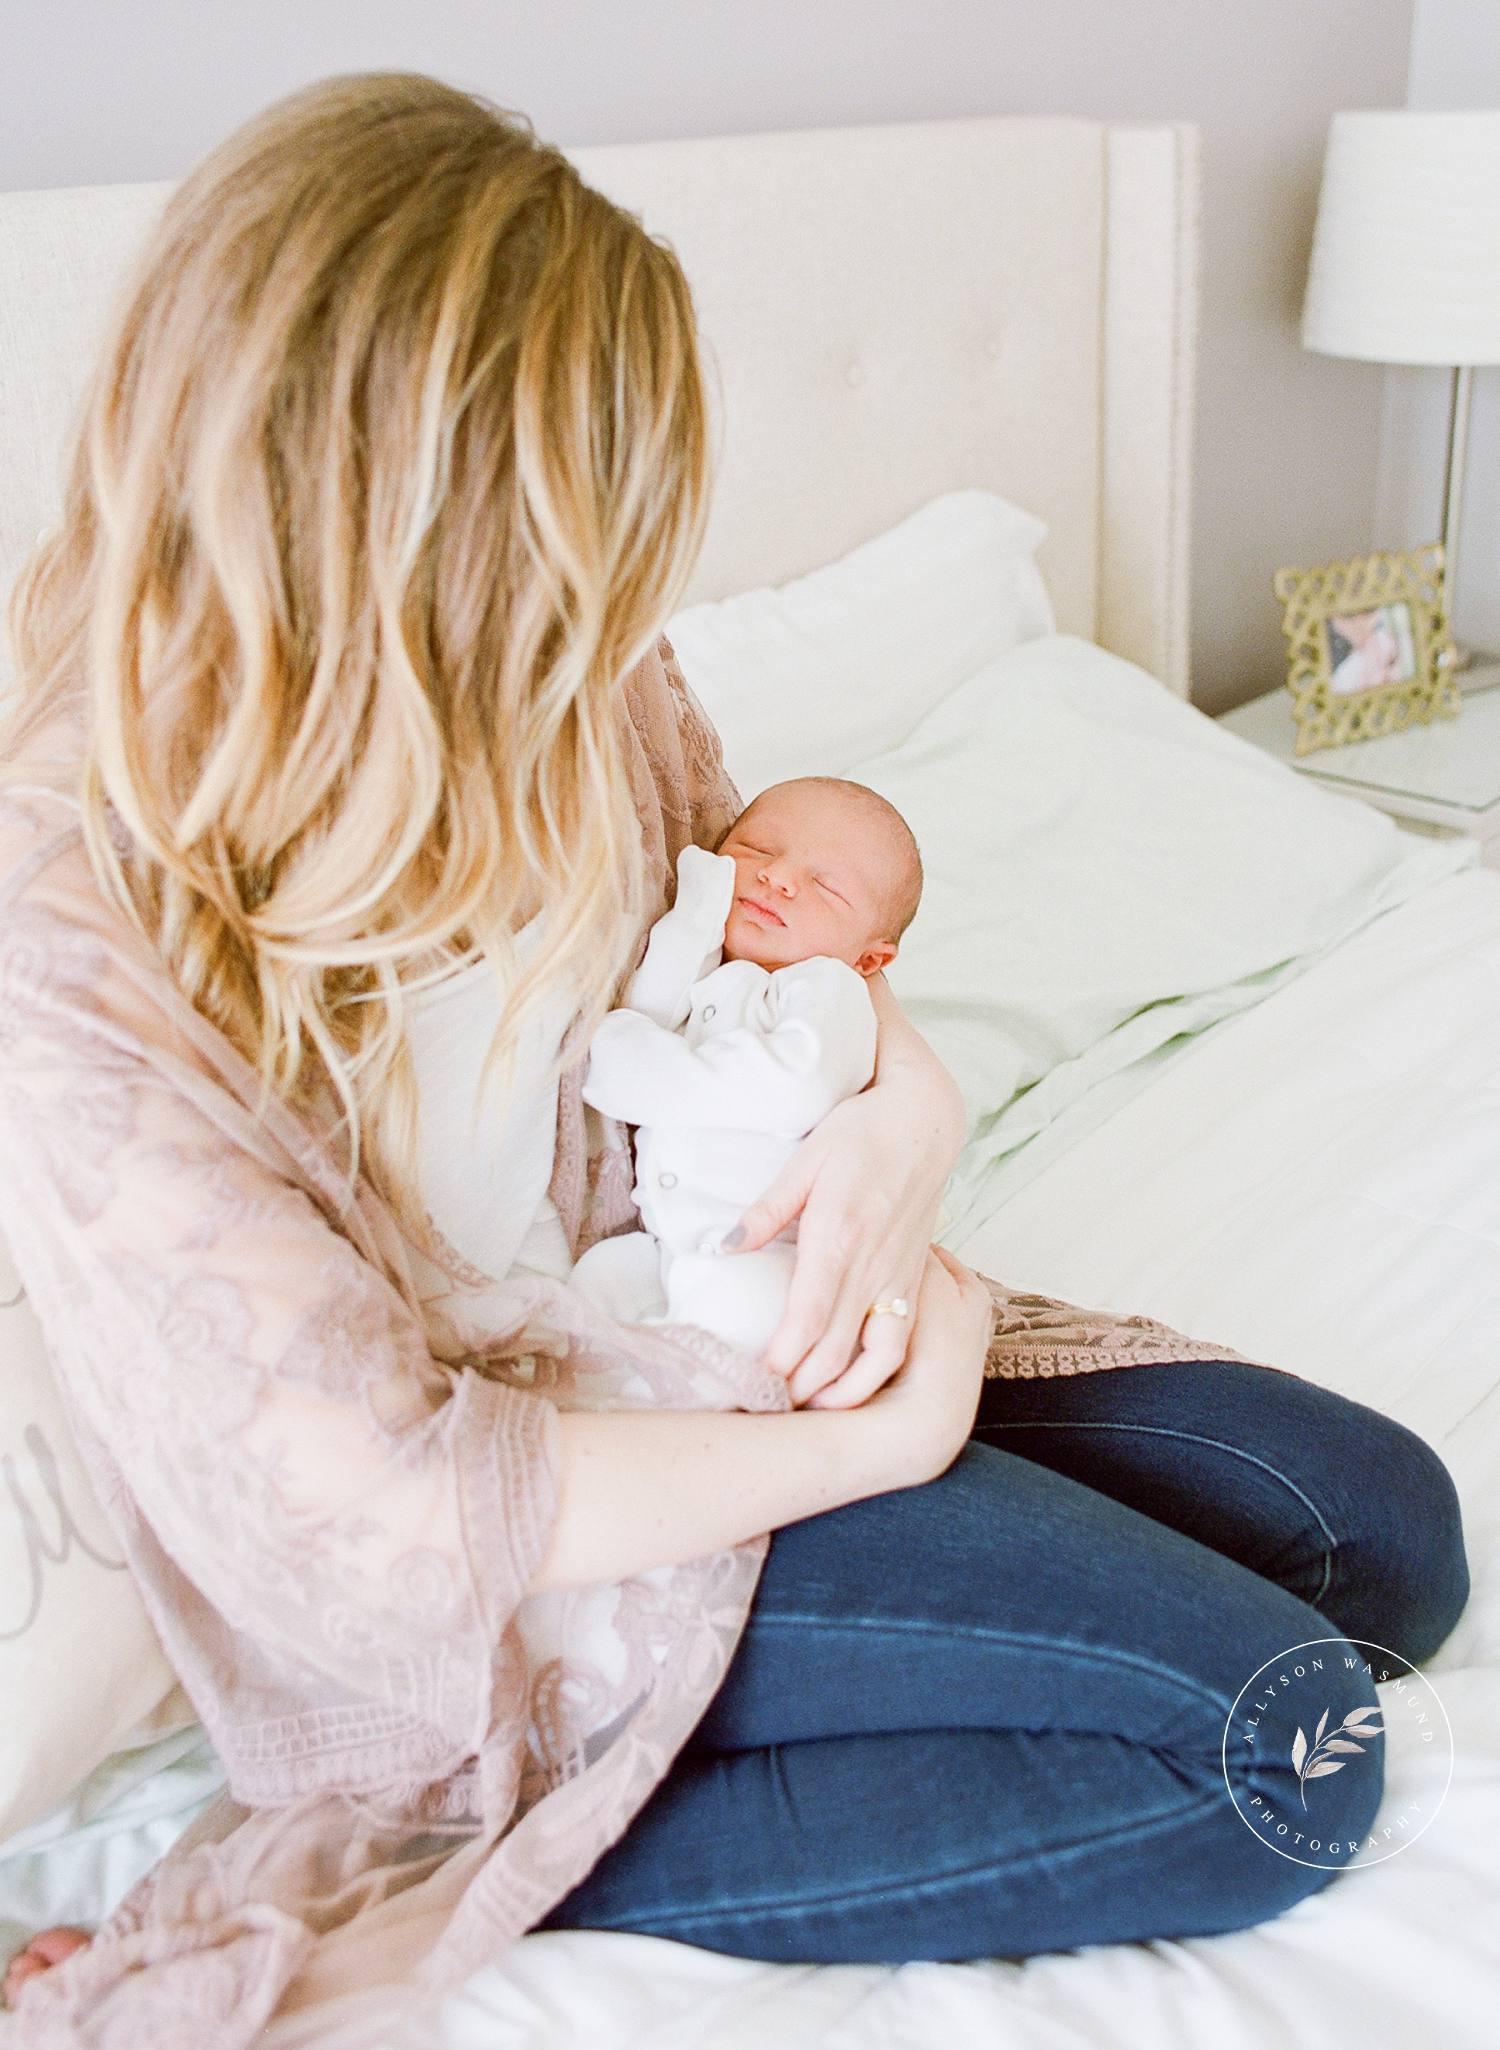 maple-grove-mn-newborn-photographer-baby-jacob_0009.jpg